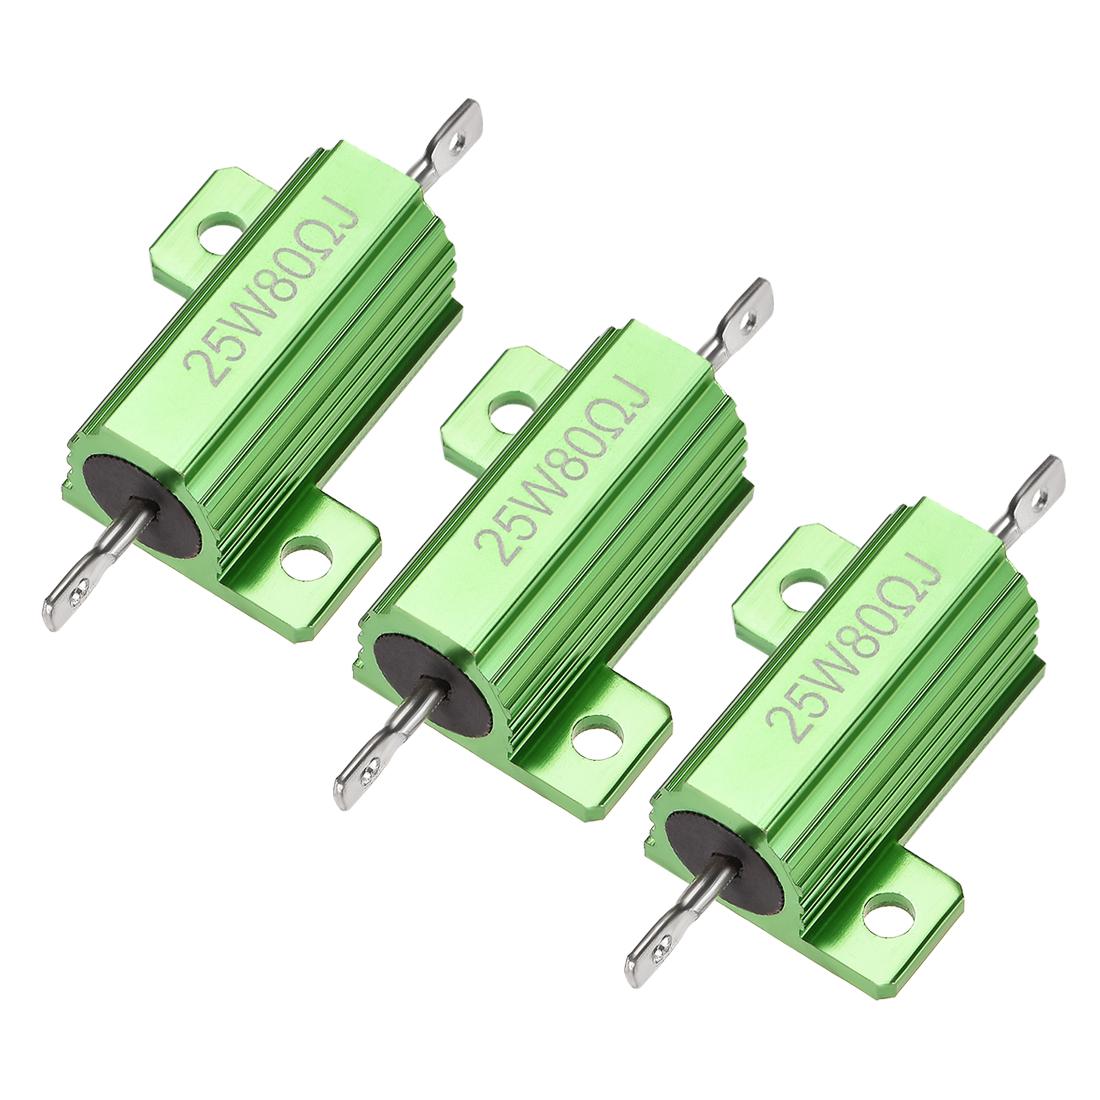 25W 80 Ohm 5% Aluminum Housing Resistor Wirewound Resistor Green Tone 3 Pcs